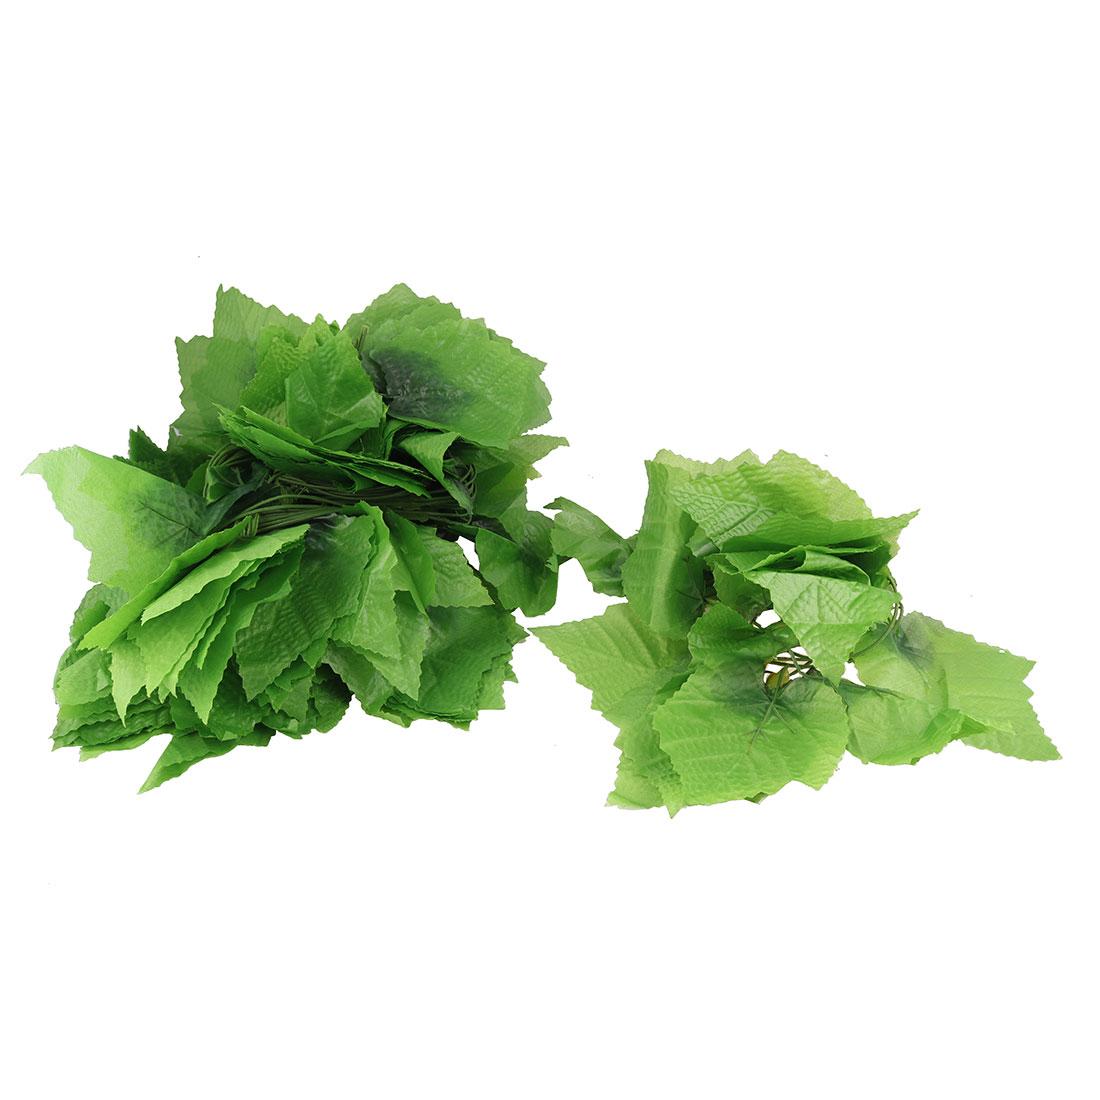 Green Artificial Simulation Ivy Grape Leaves Flowers Plants Home Room Garden Garland Decor 12 Pcs